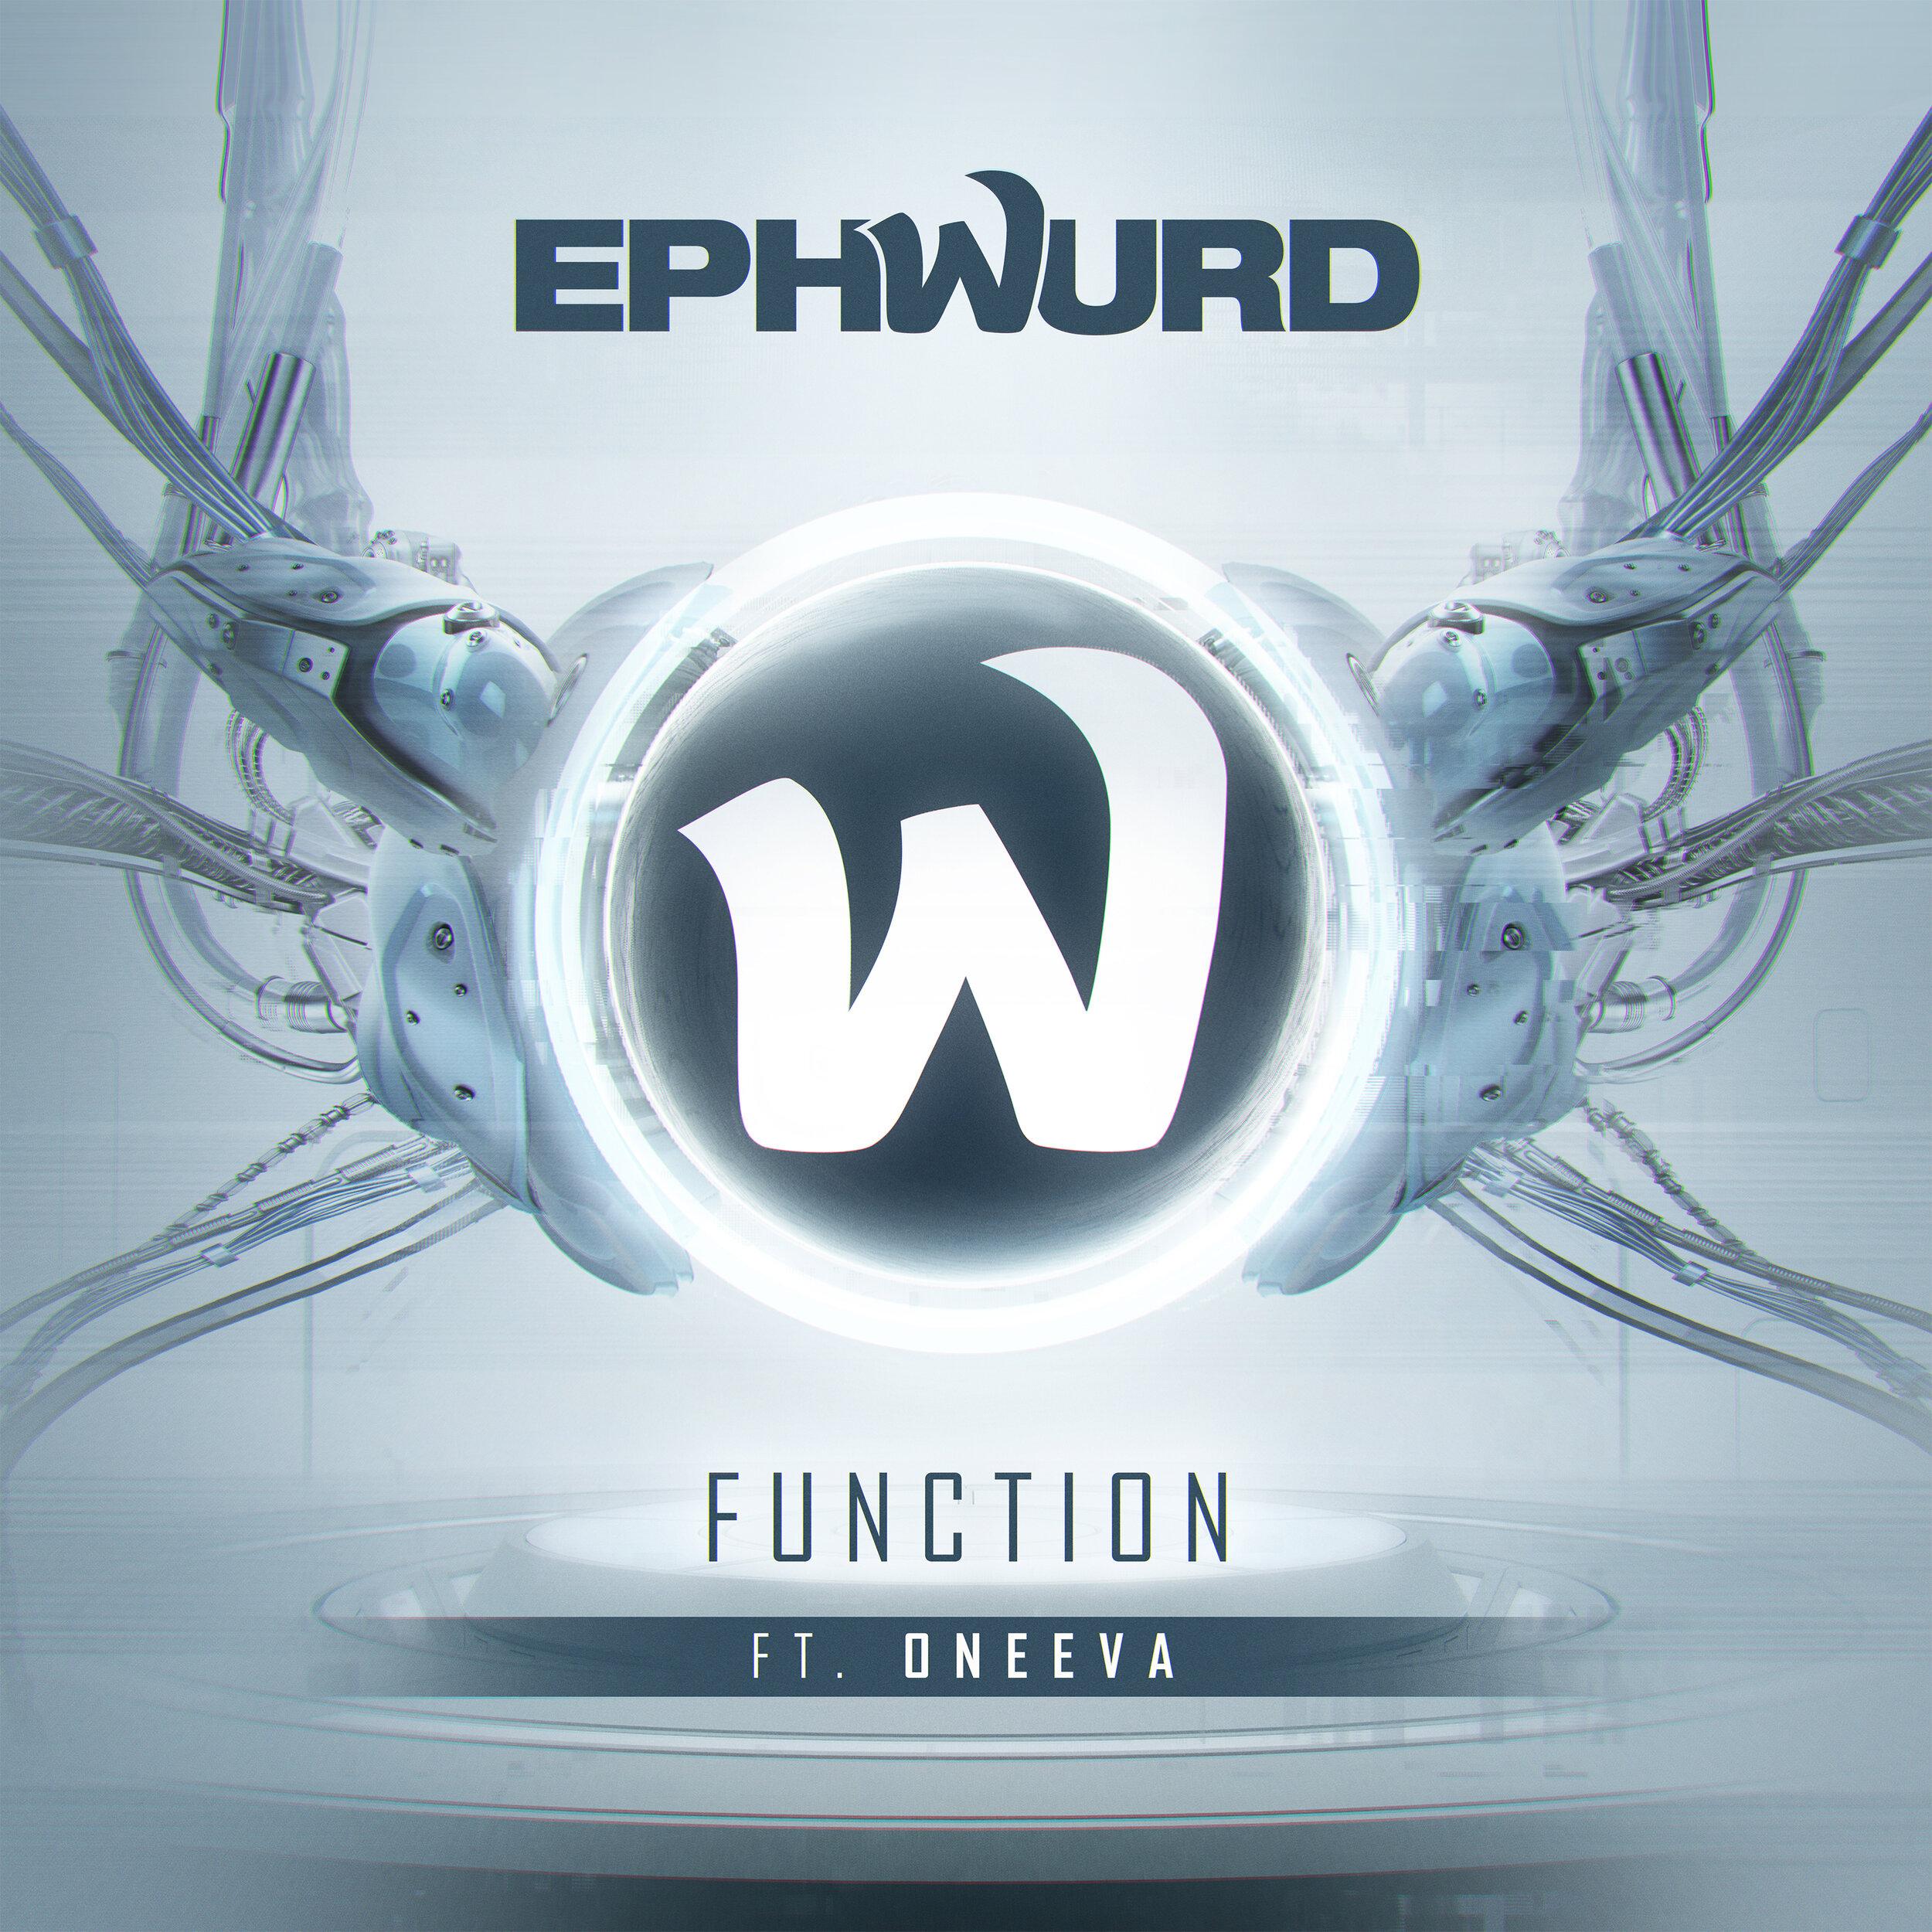 ephwurd_function_art_3000px.jpg